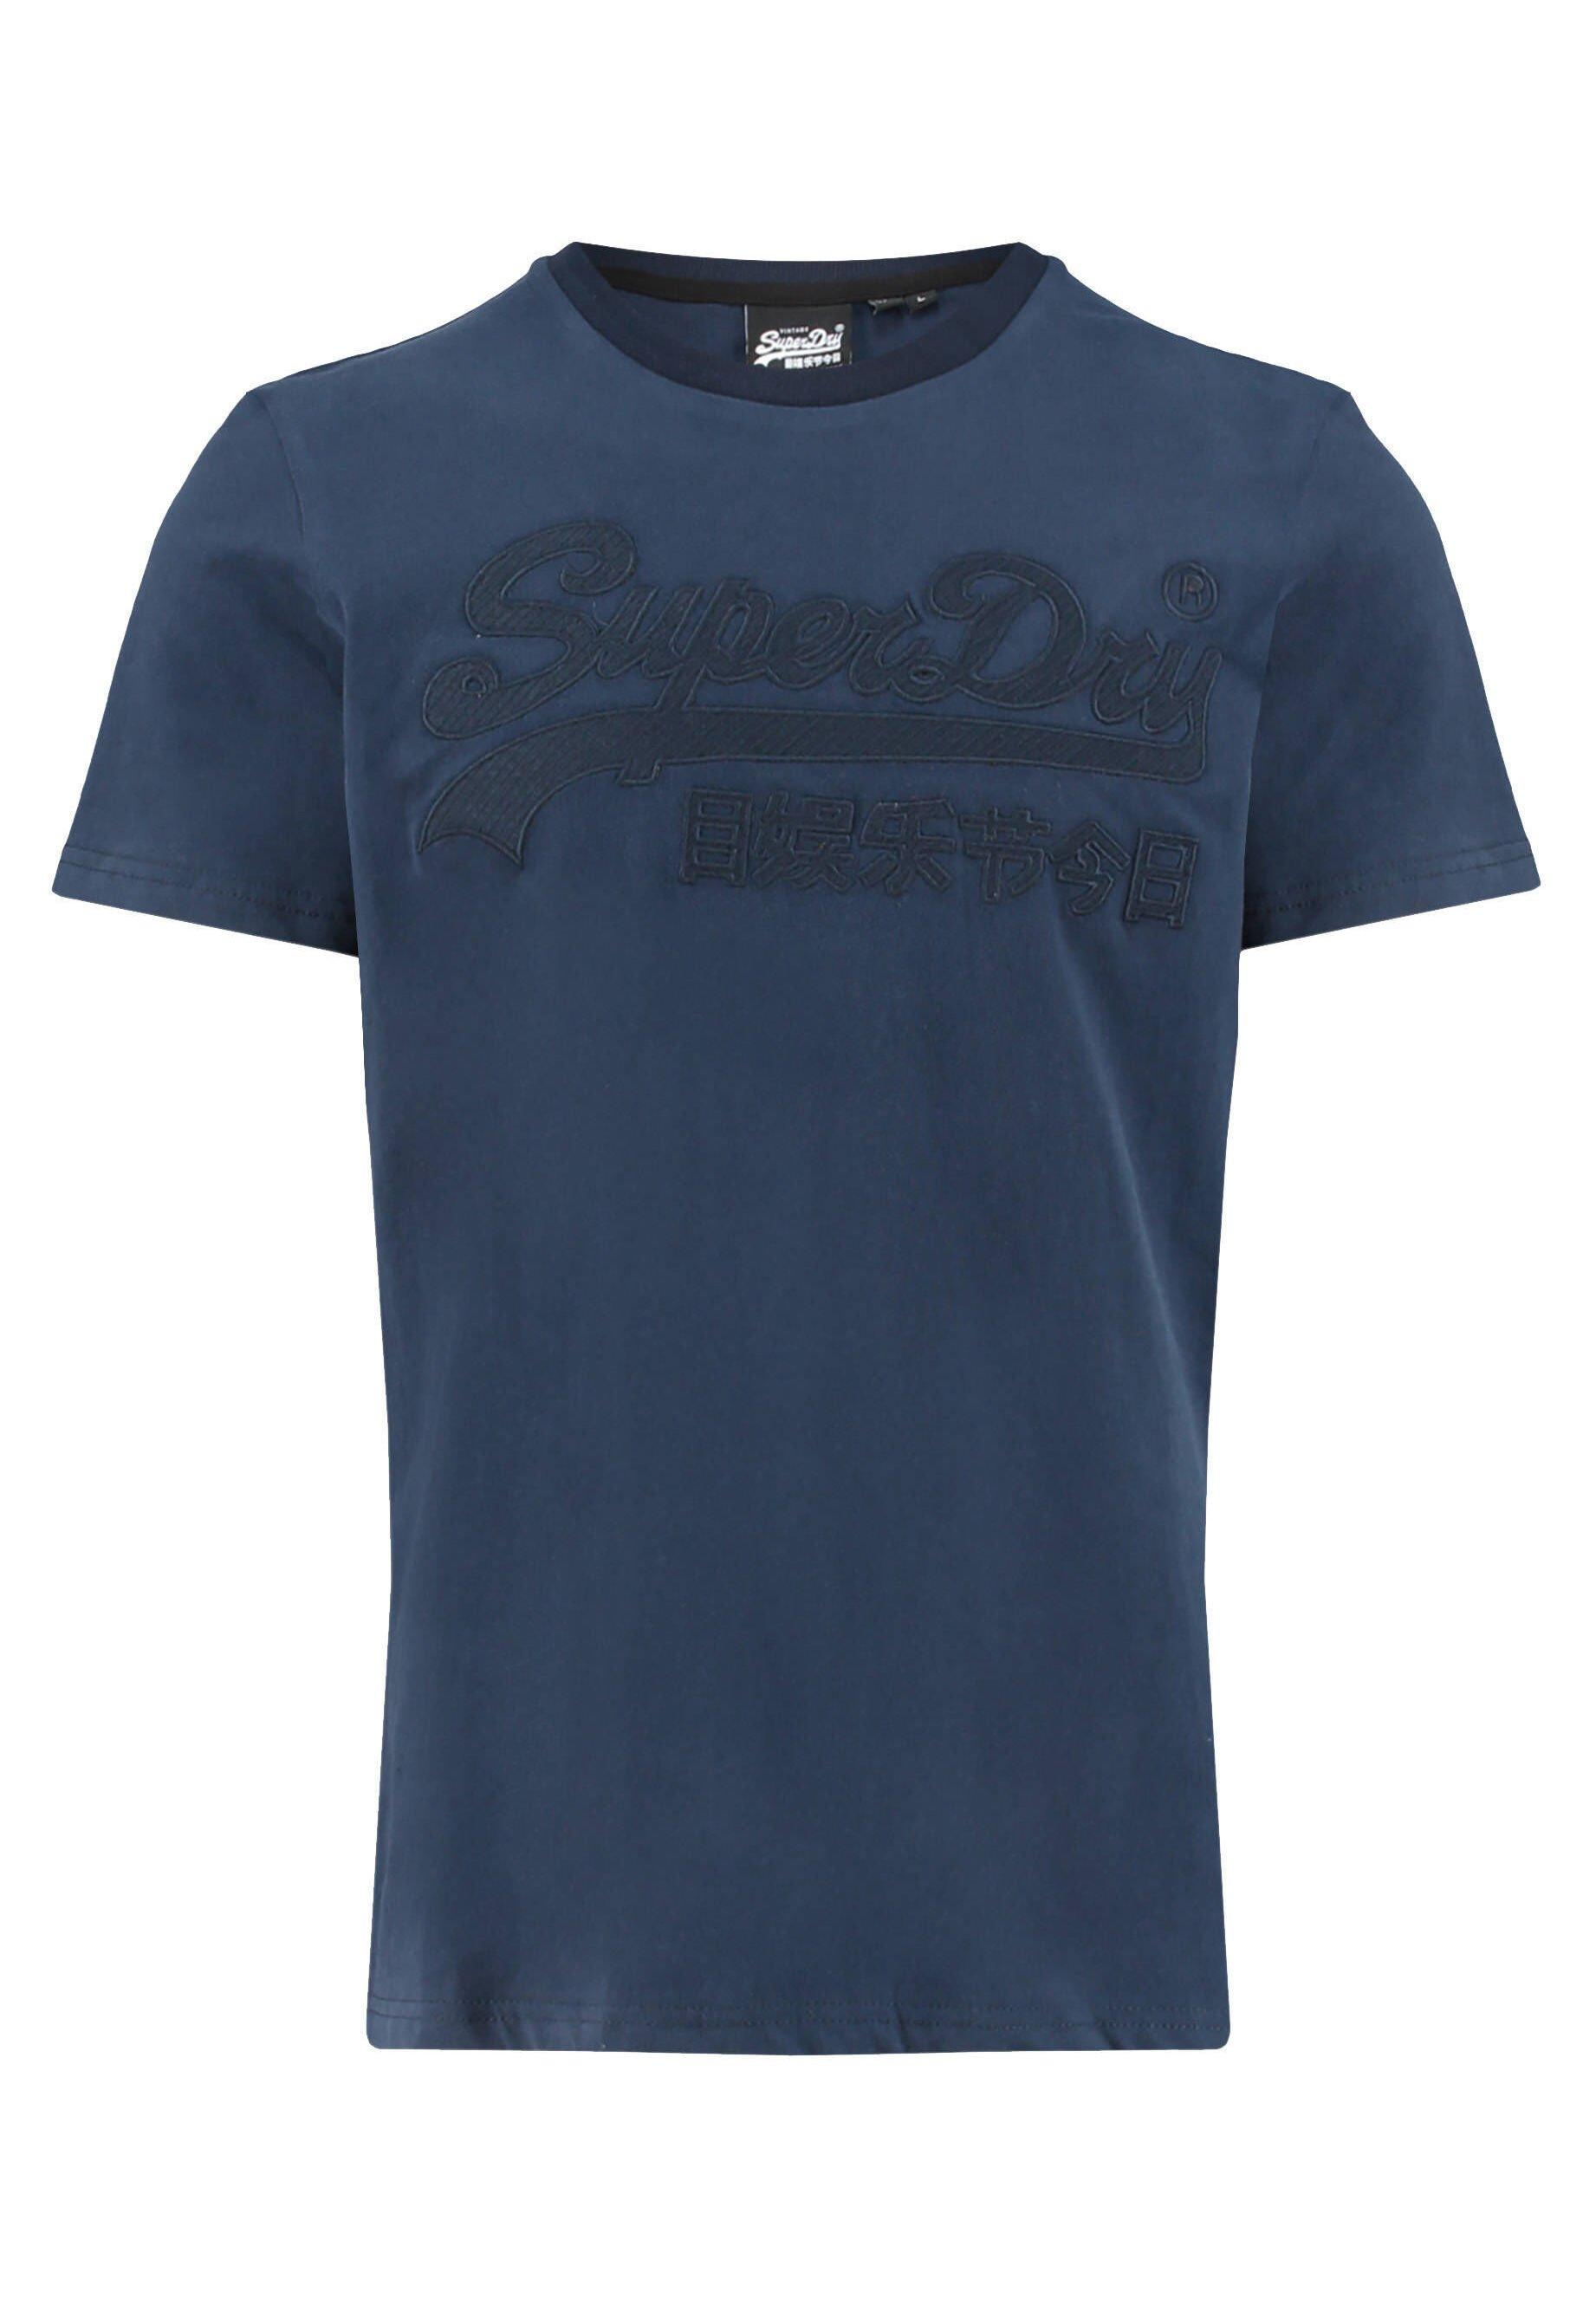 Superdry T-shirt print - marine (52)  Heren shirts XoPA4